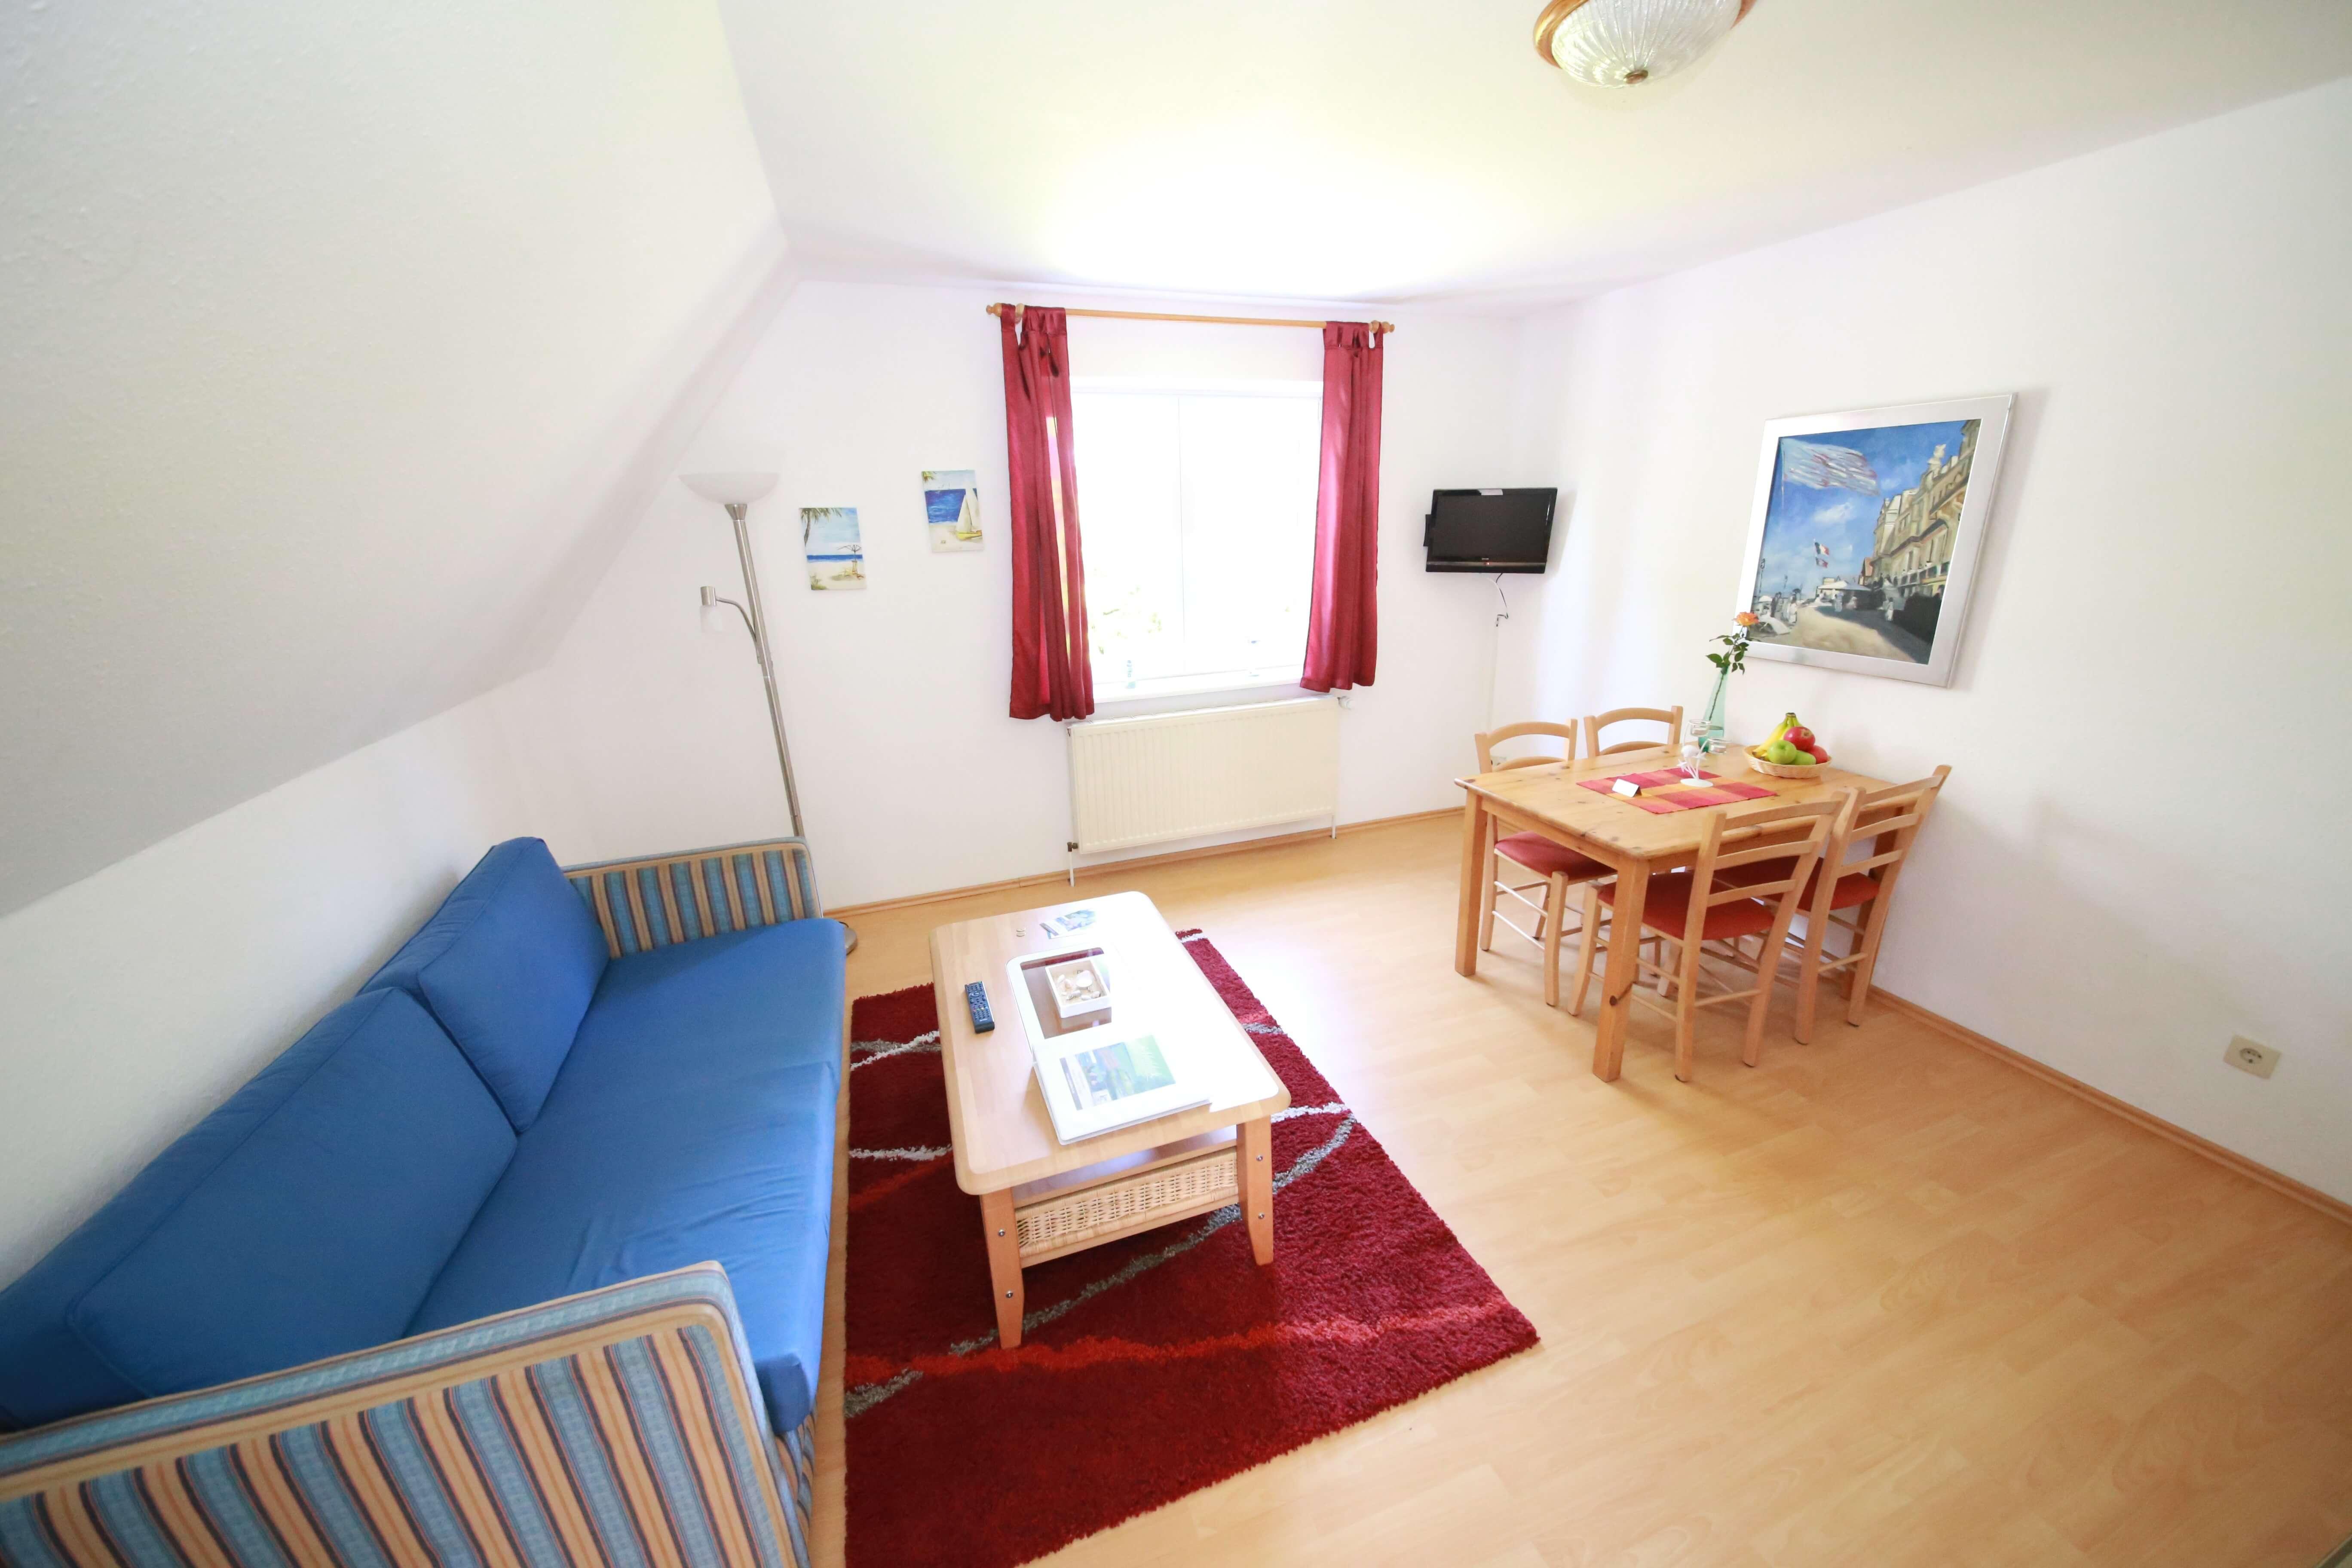 Apartment 5 4 personen apartmenthaus schleiblick for Kochen 4 personen